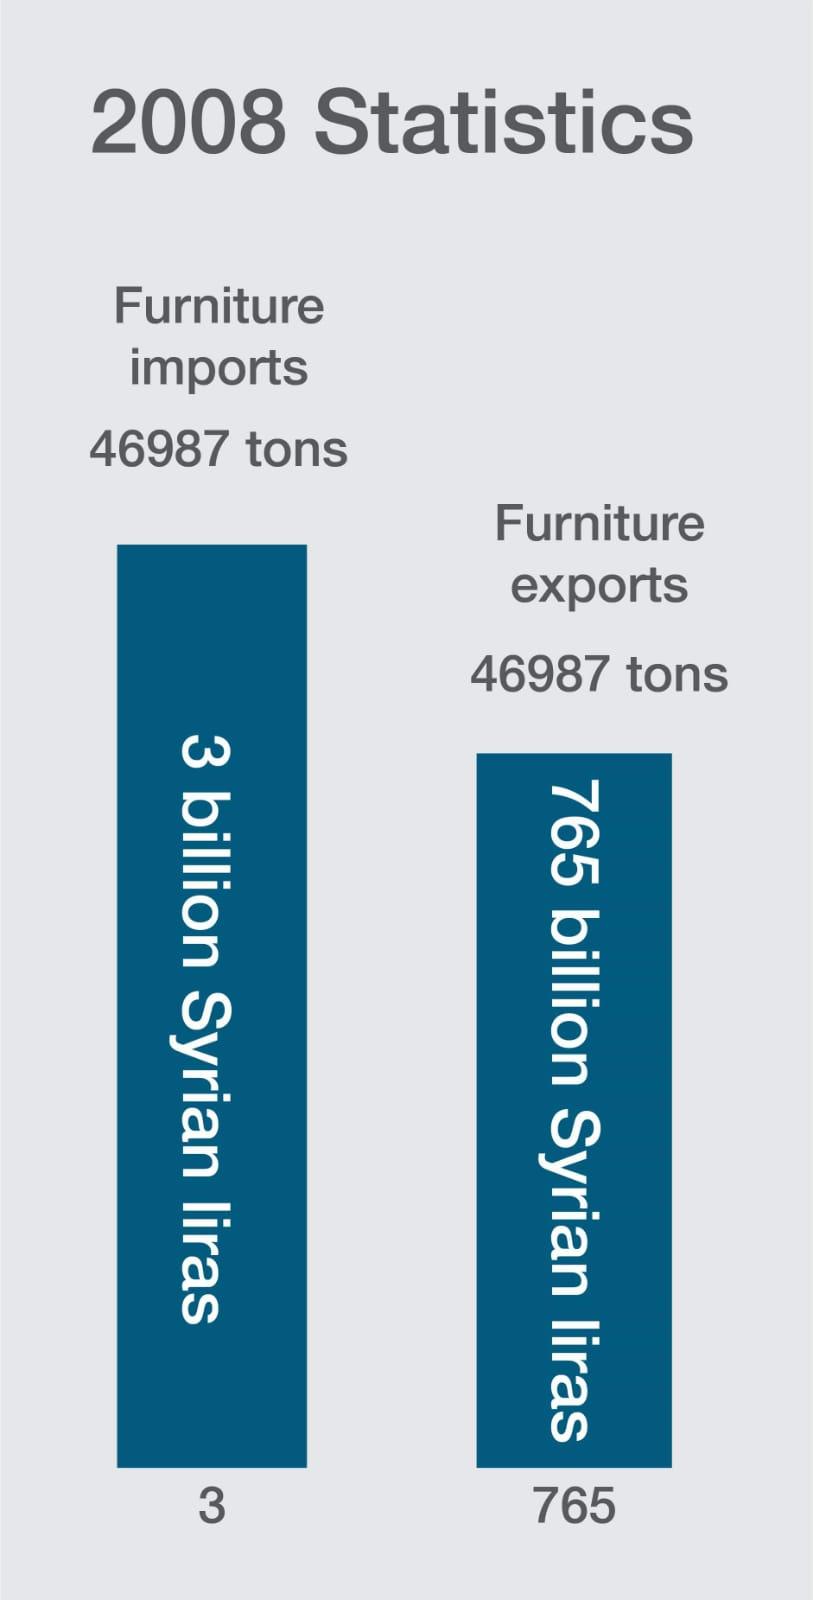 Source: Central Bureau of Statistics, designed by Enab Baladi